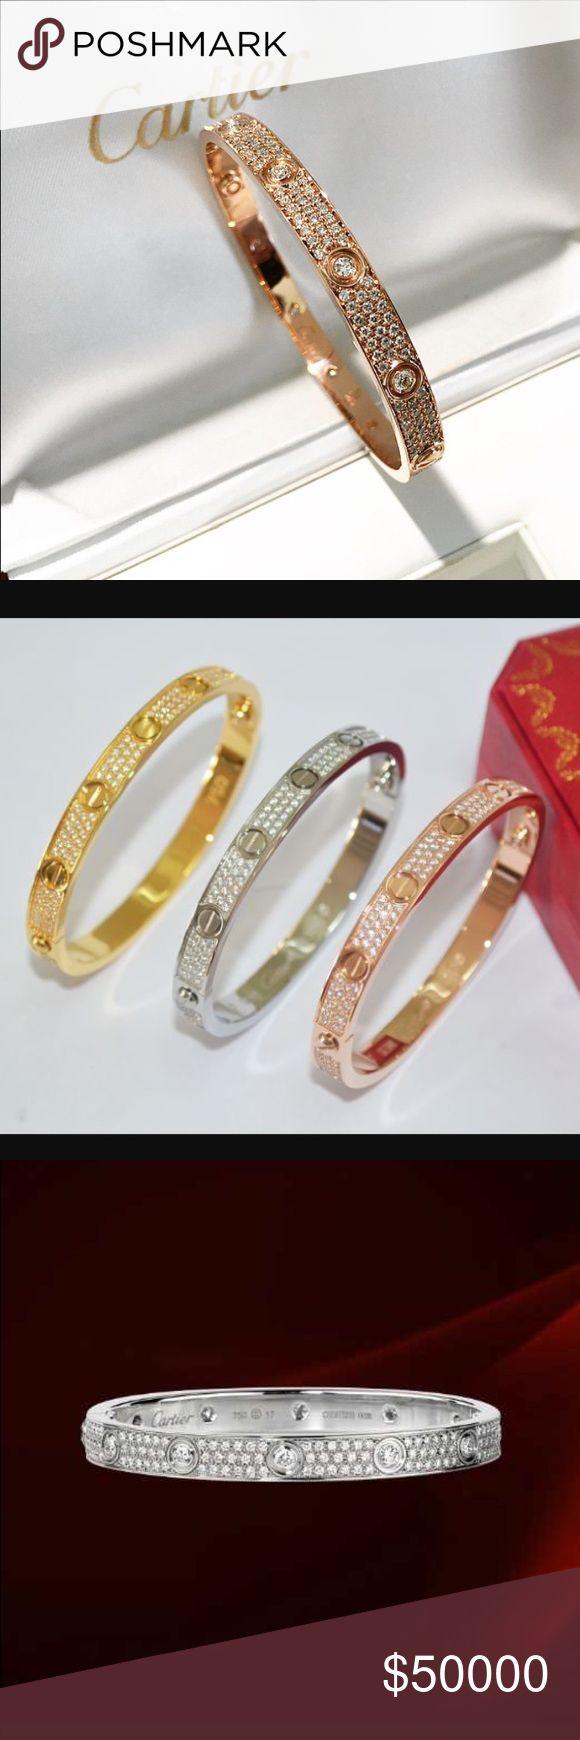 25+ best ideas about Cartier love bracelet on Pinterest ...